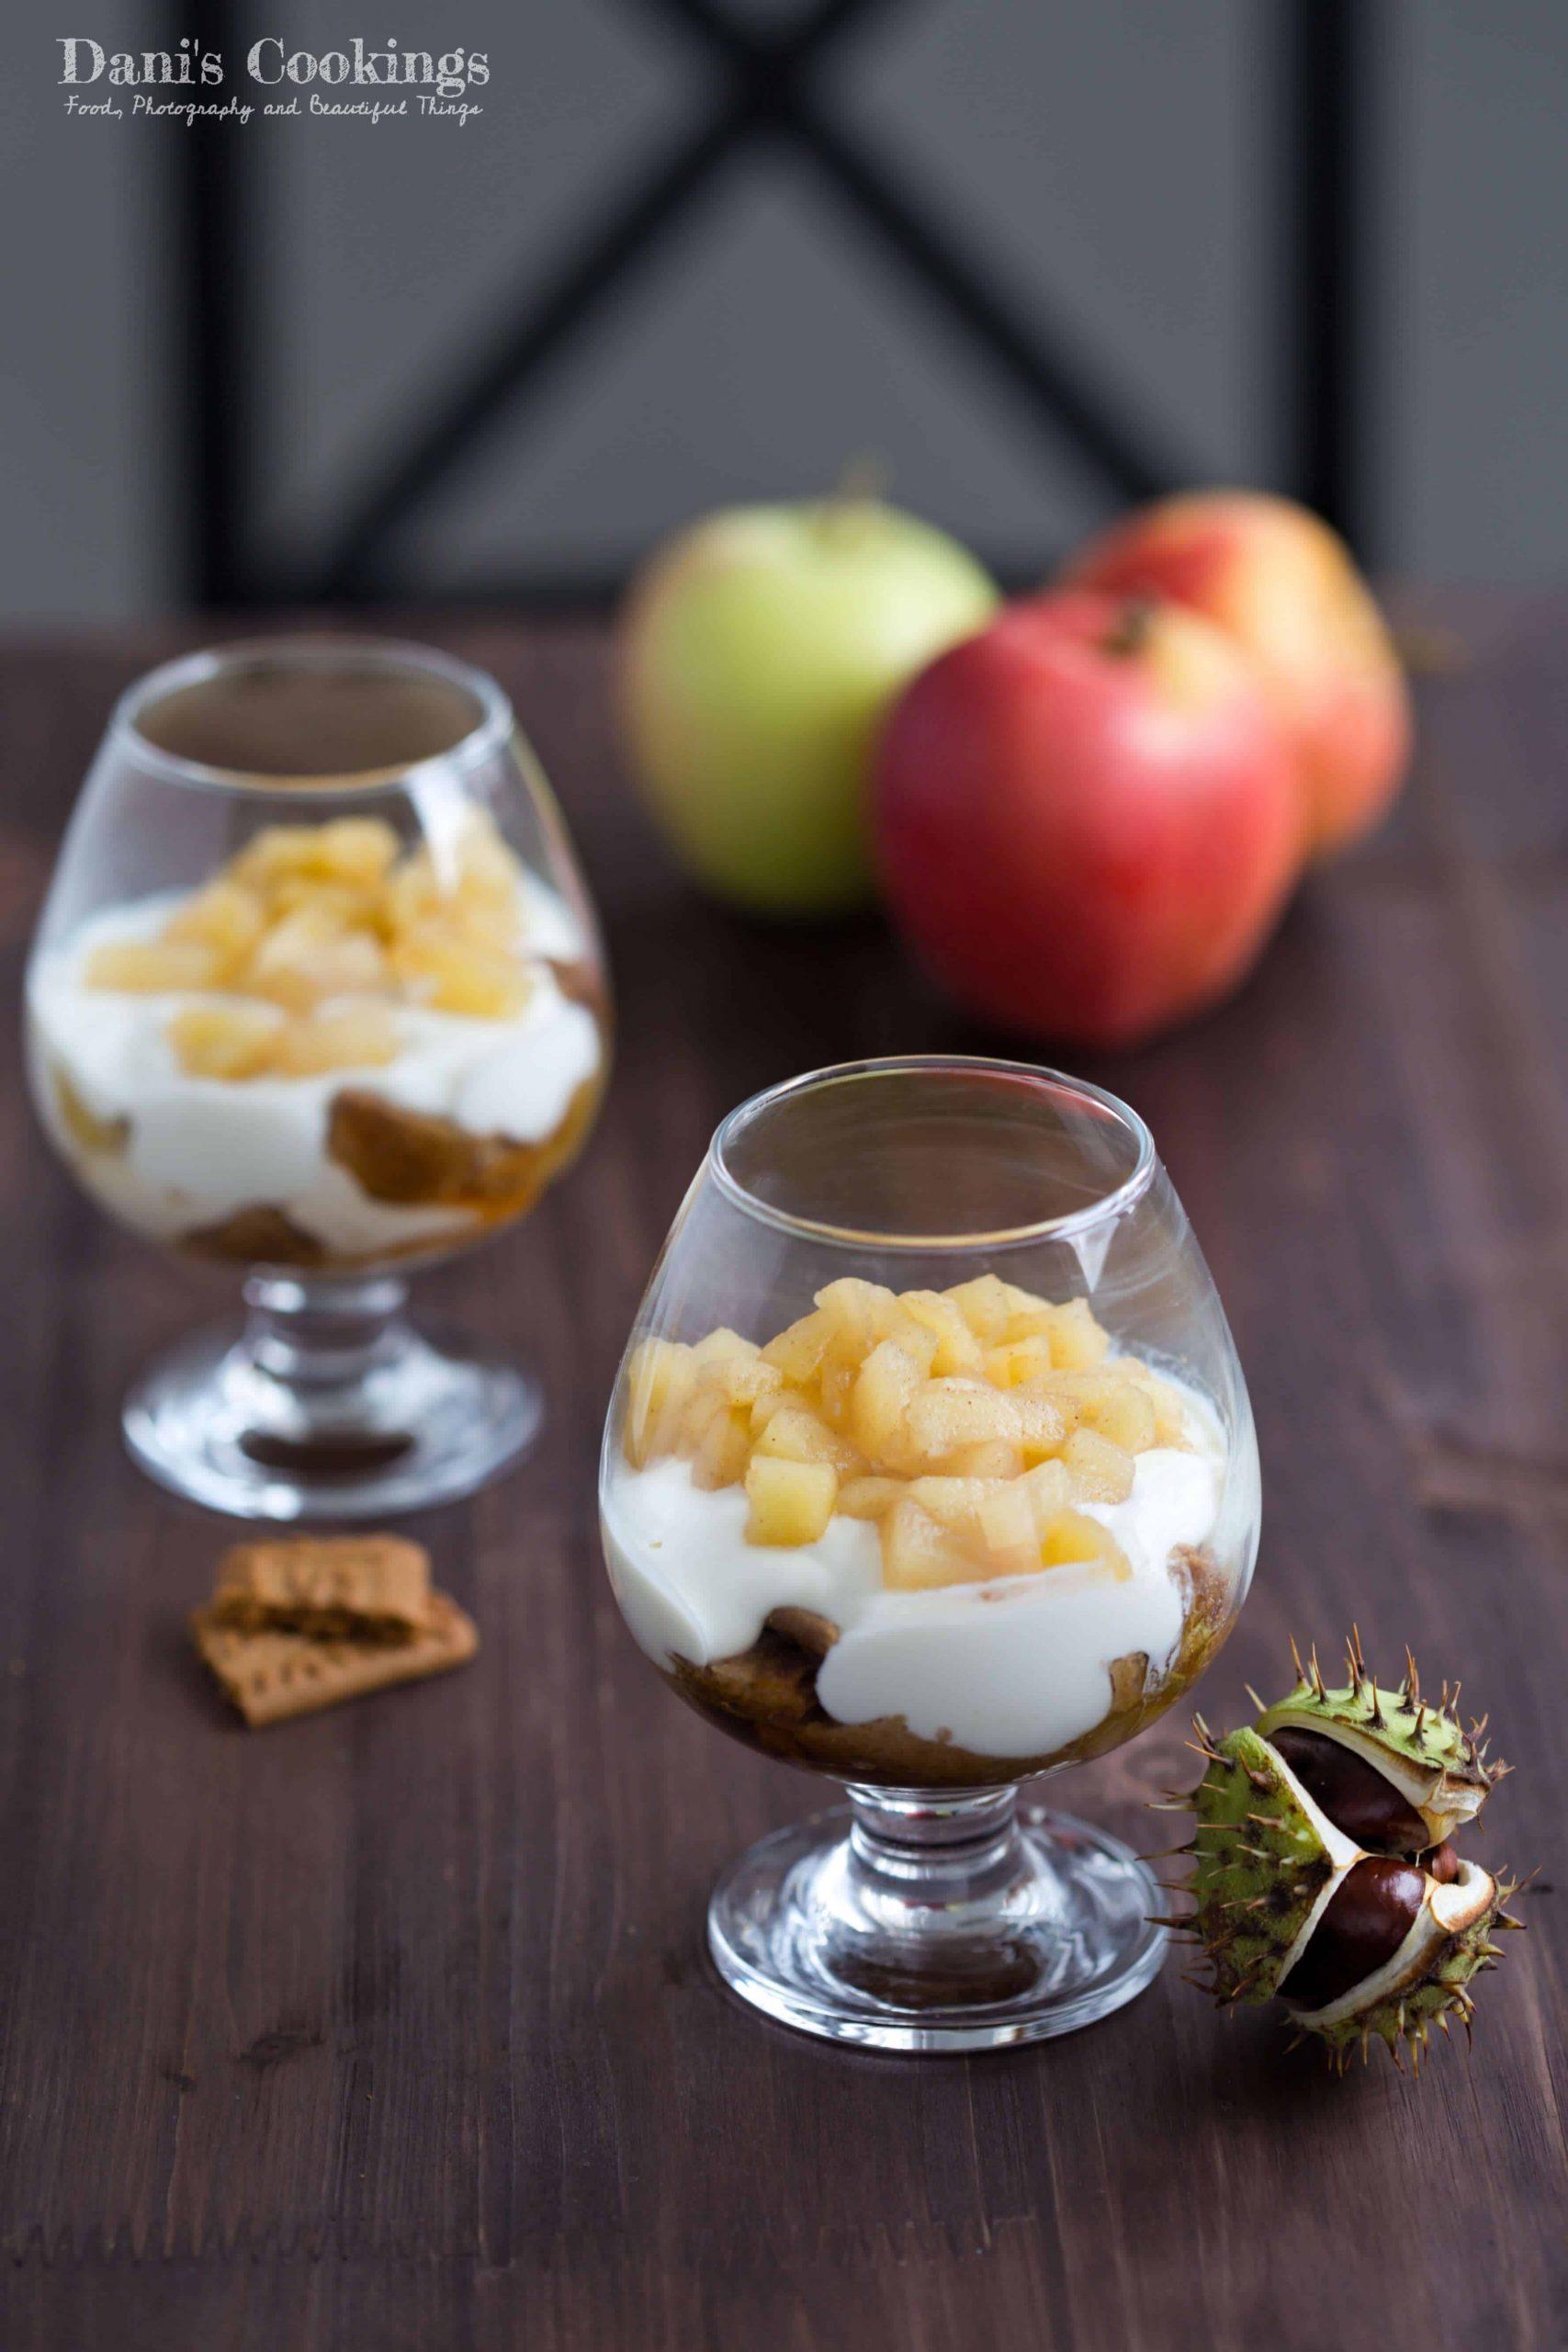 Easy Honey Apple Yogurt Dessert in a Glass   Dani's Cookings